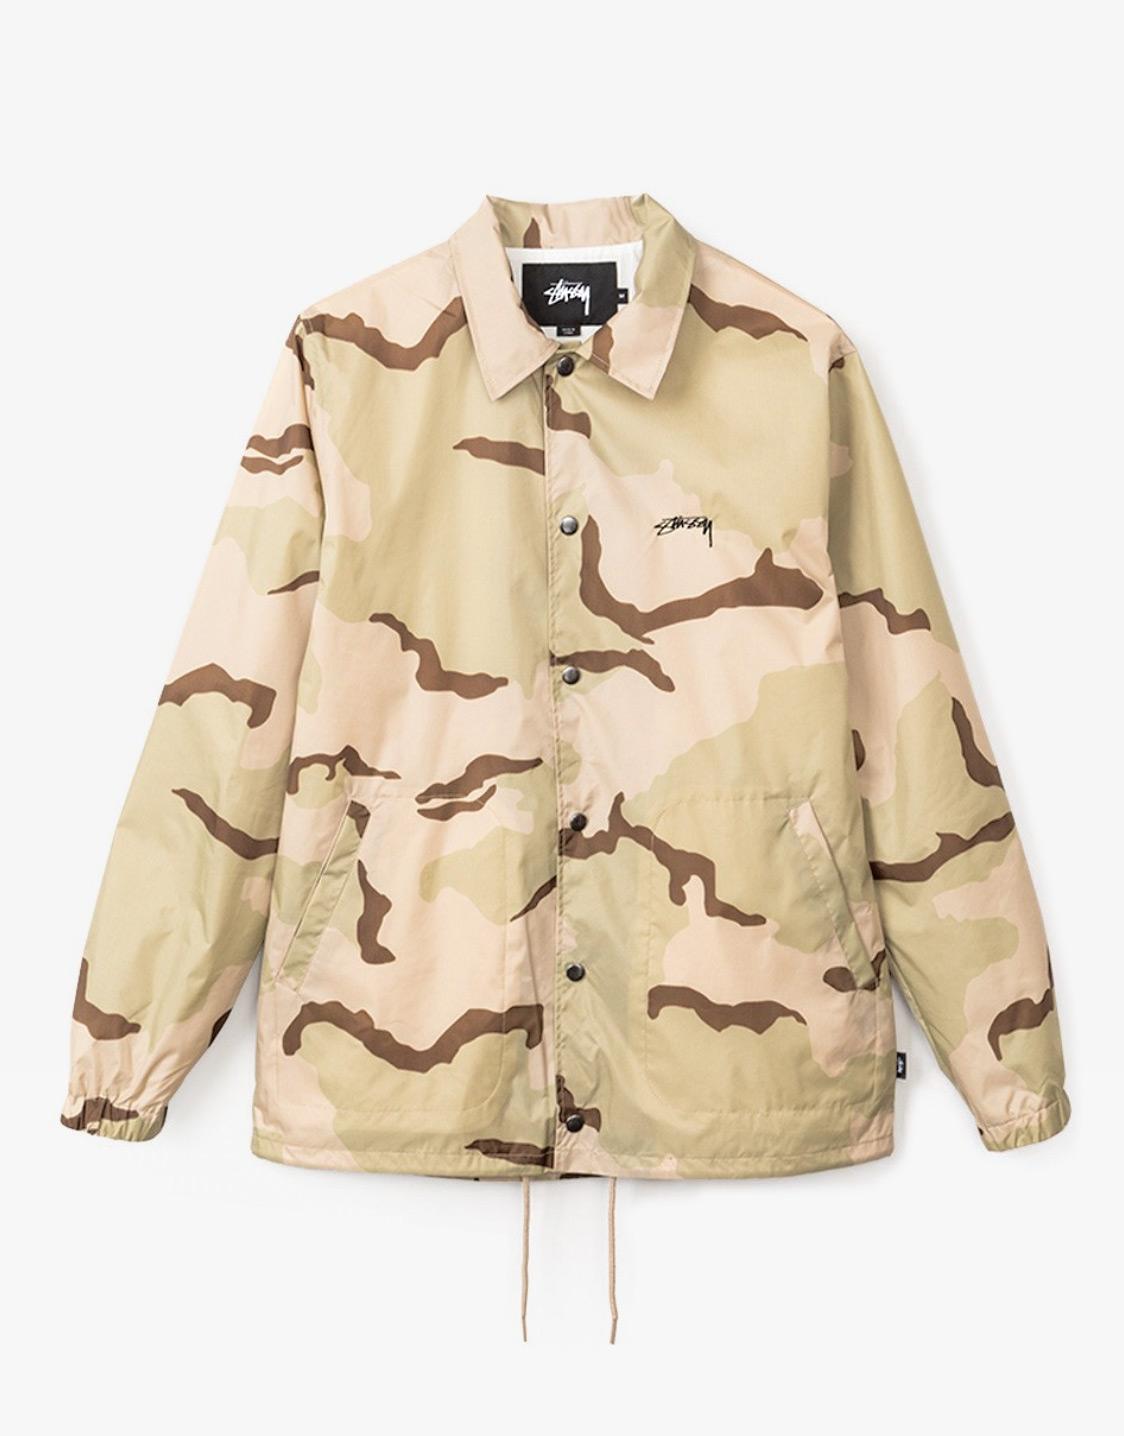 6028e0e916f5 Stussy Camo coach jacket - OnTheBlock